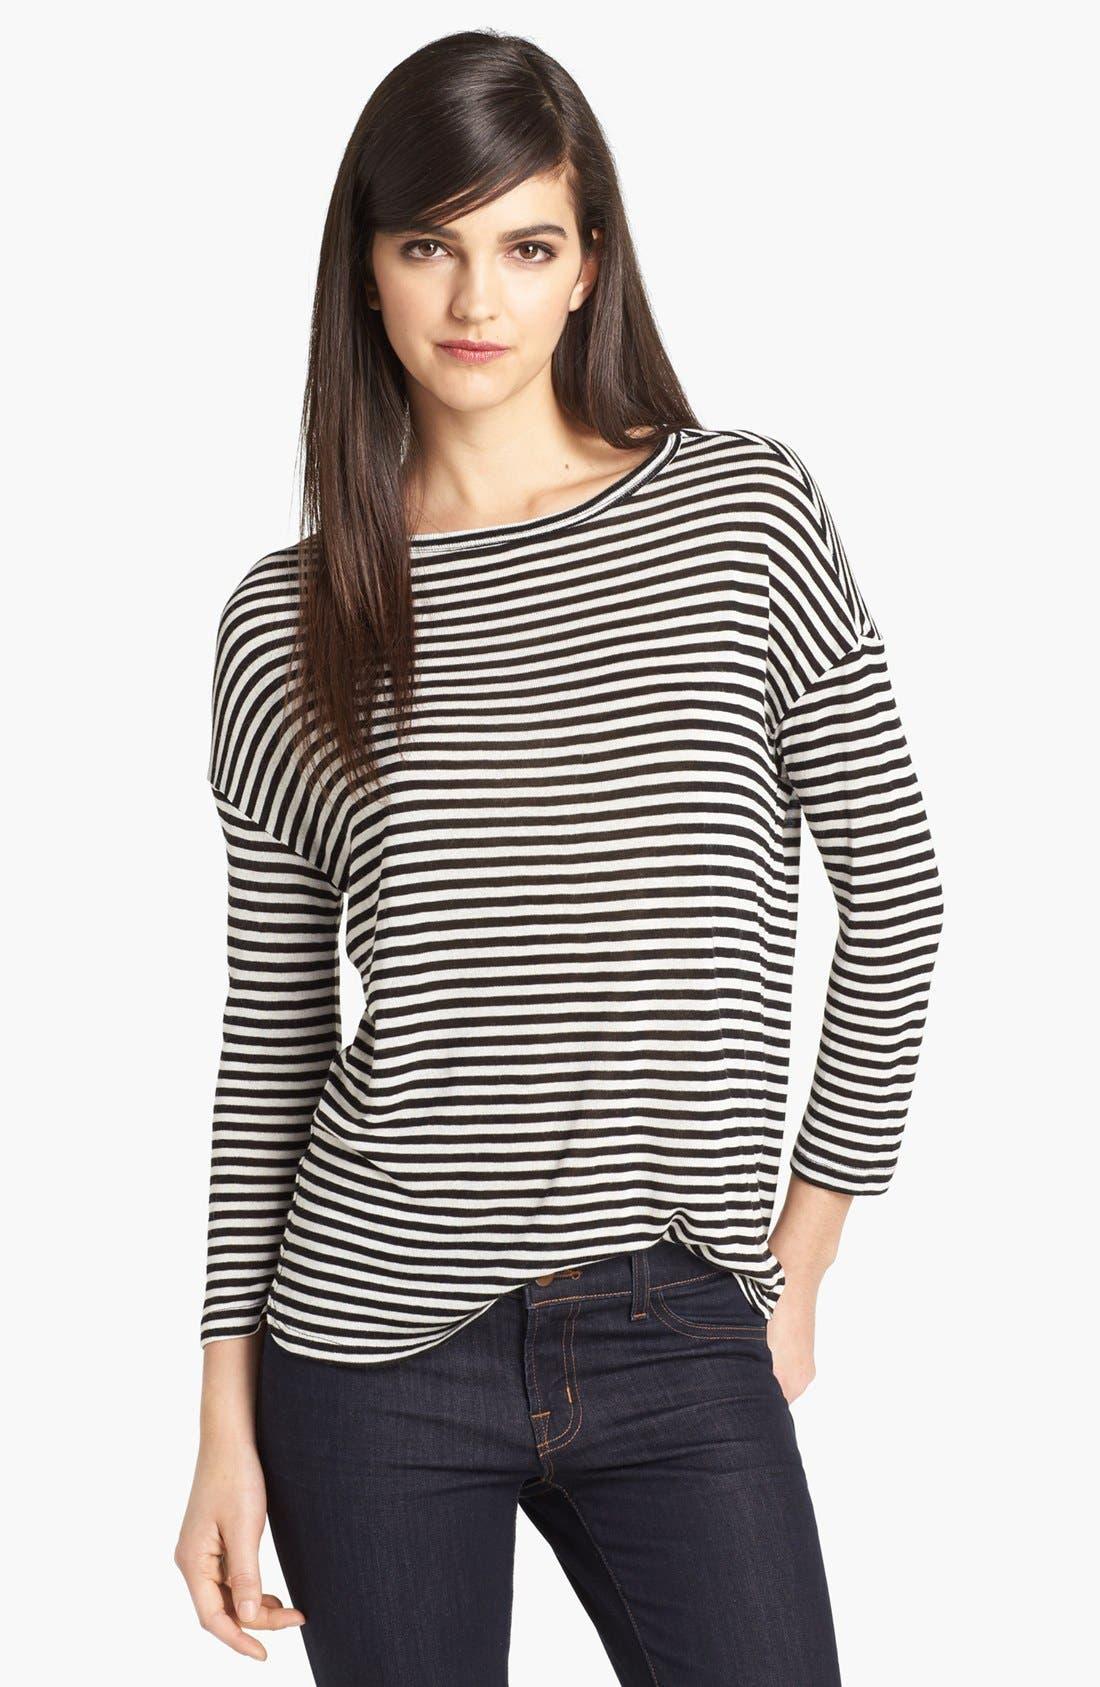 Main Image - Soft Joie 'Nash' Stripe Top